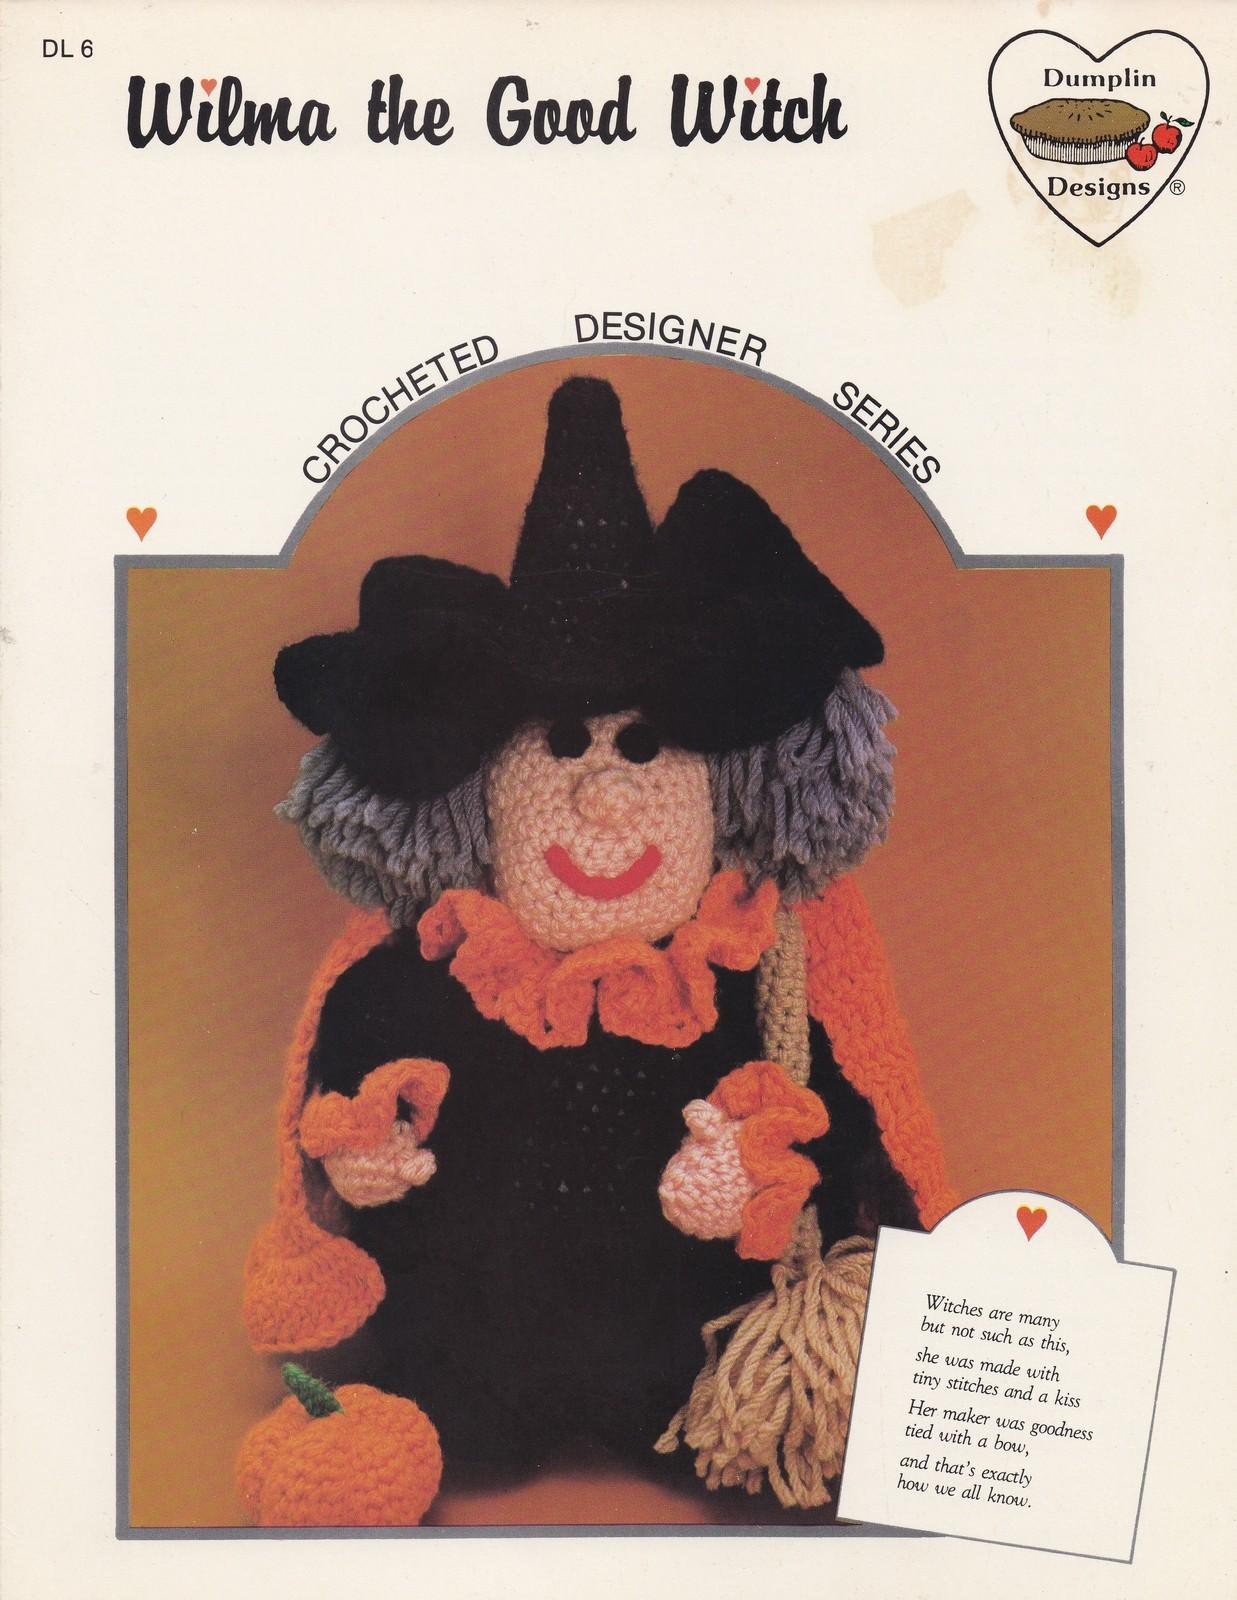 Wilma the Good Witch, Dumplin Designs Halloween Doll Crochet Pattern Book DL 6